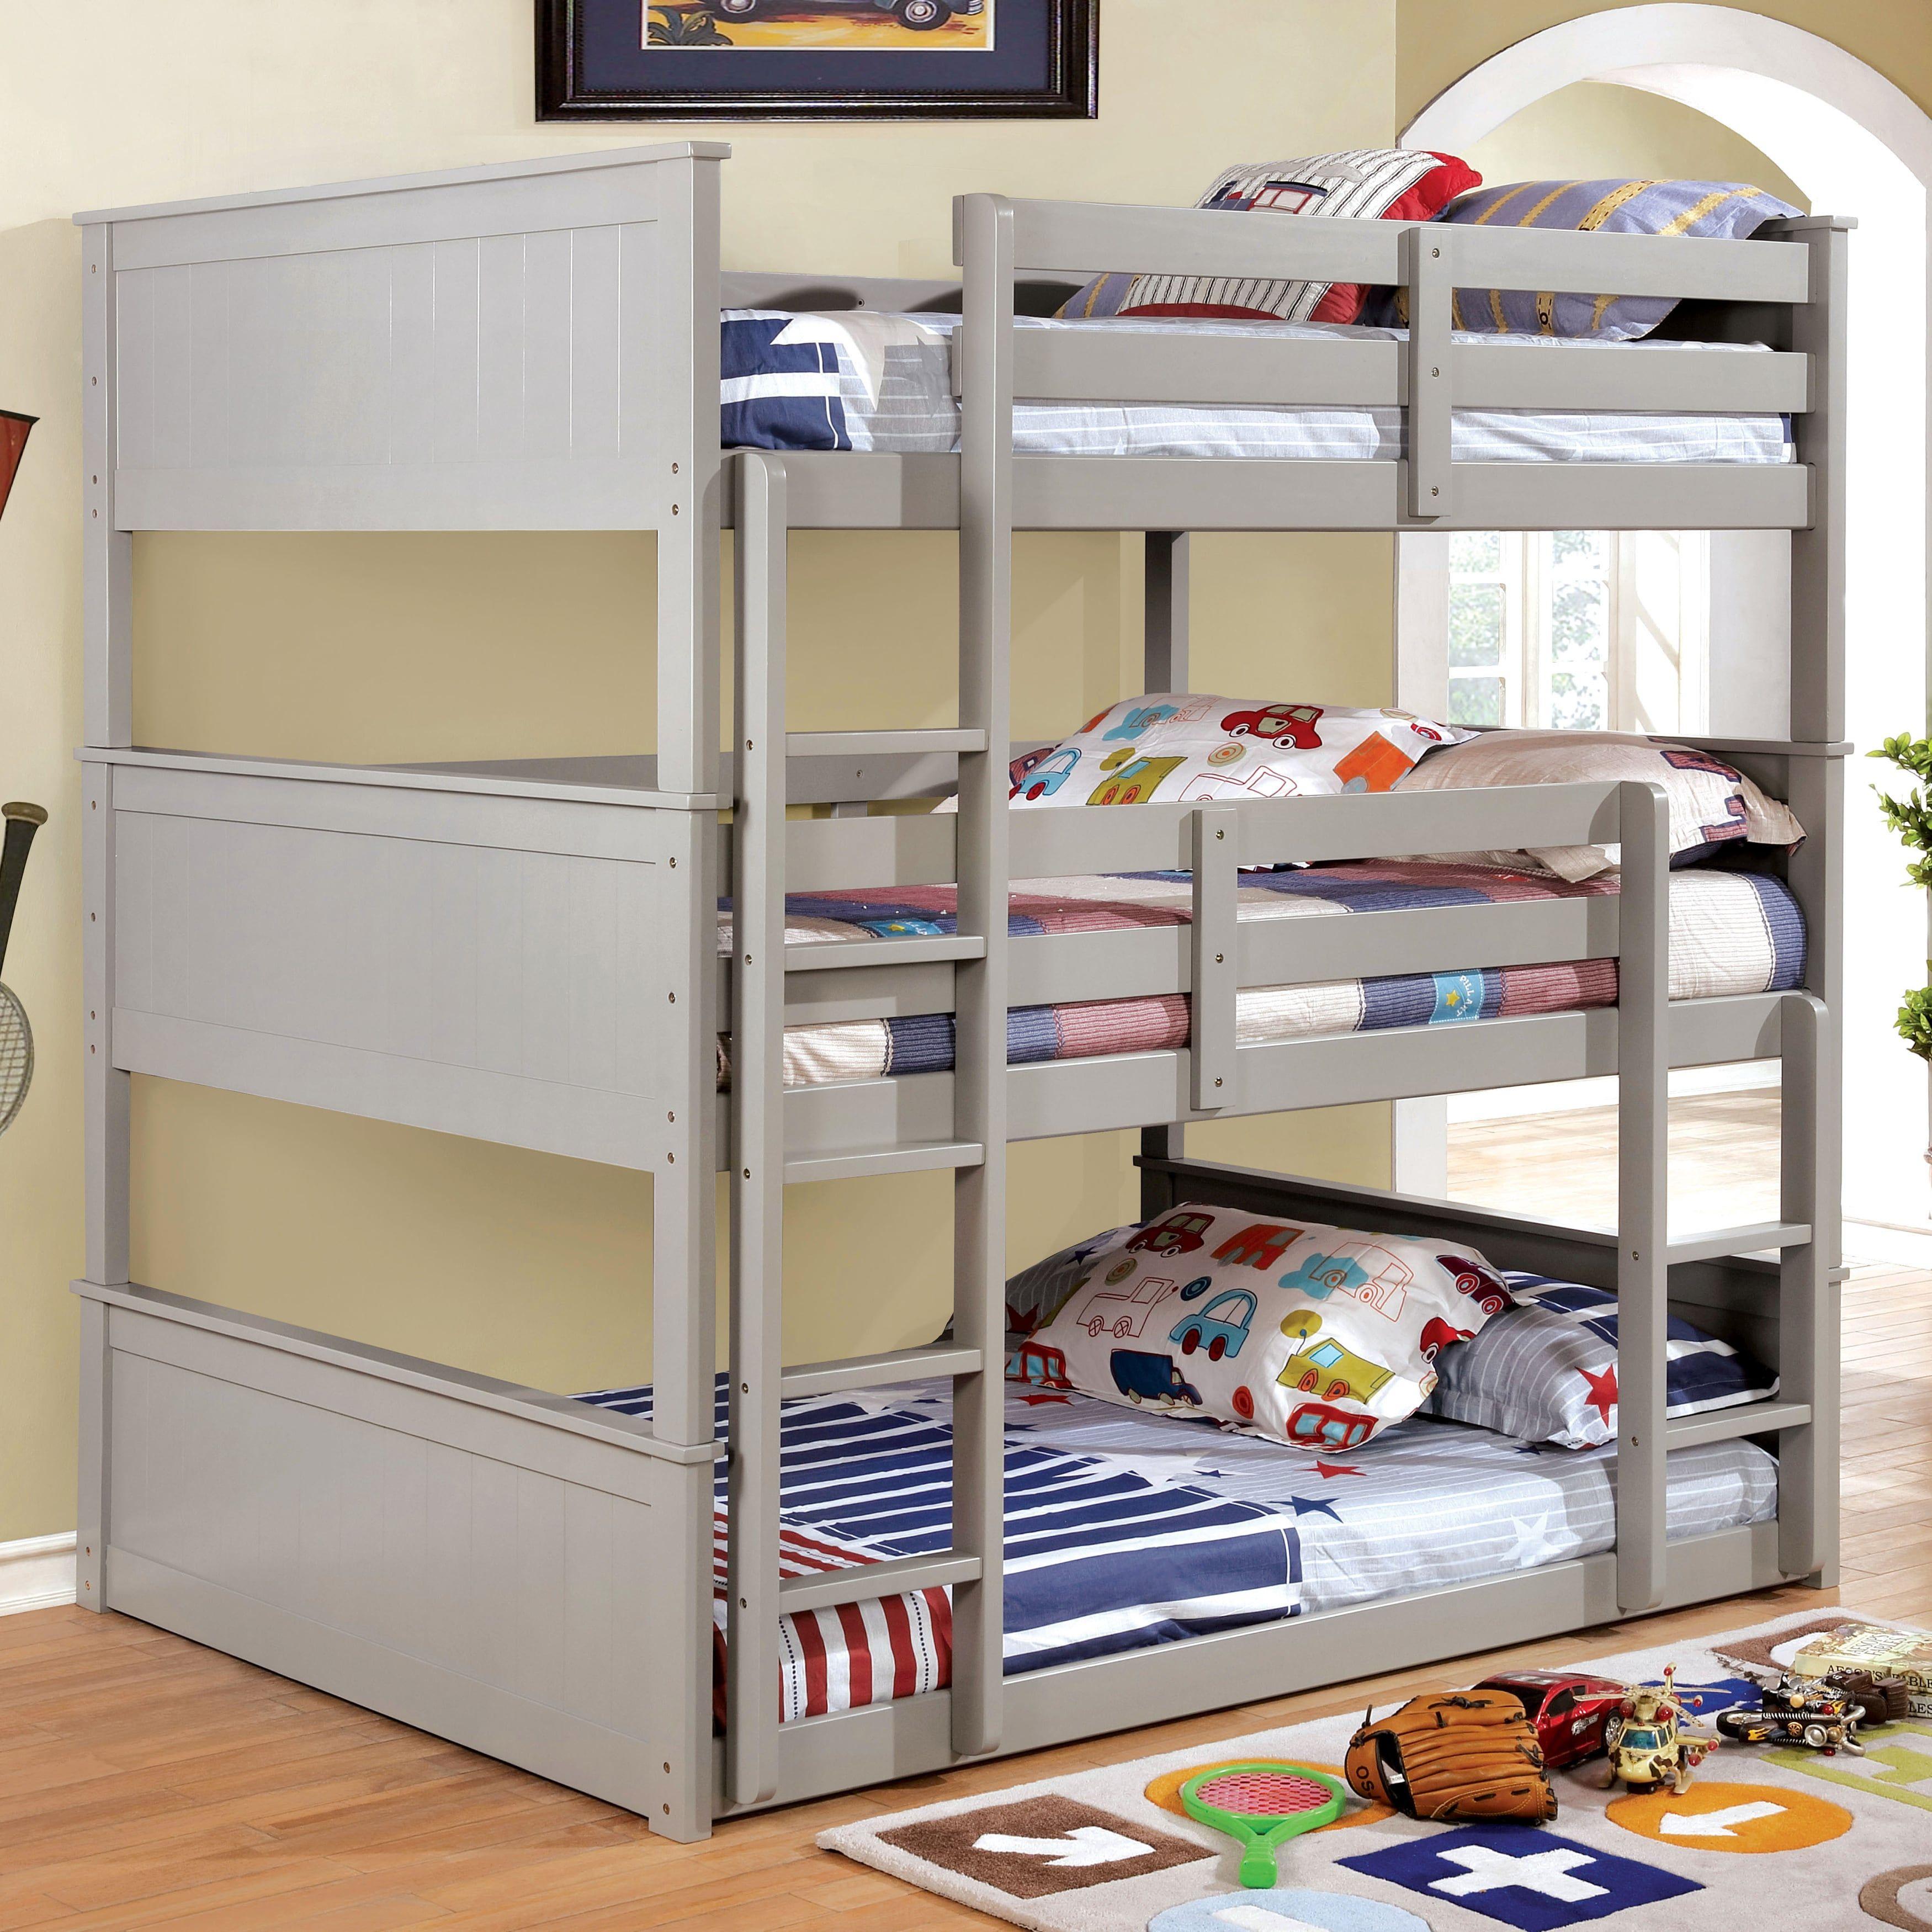 Furniture Of America Baligio Wood Transitional Triple Decker Bunk Bed